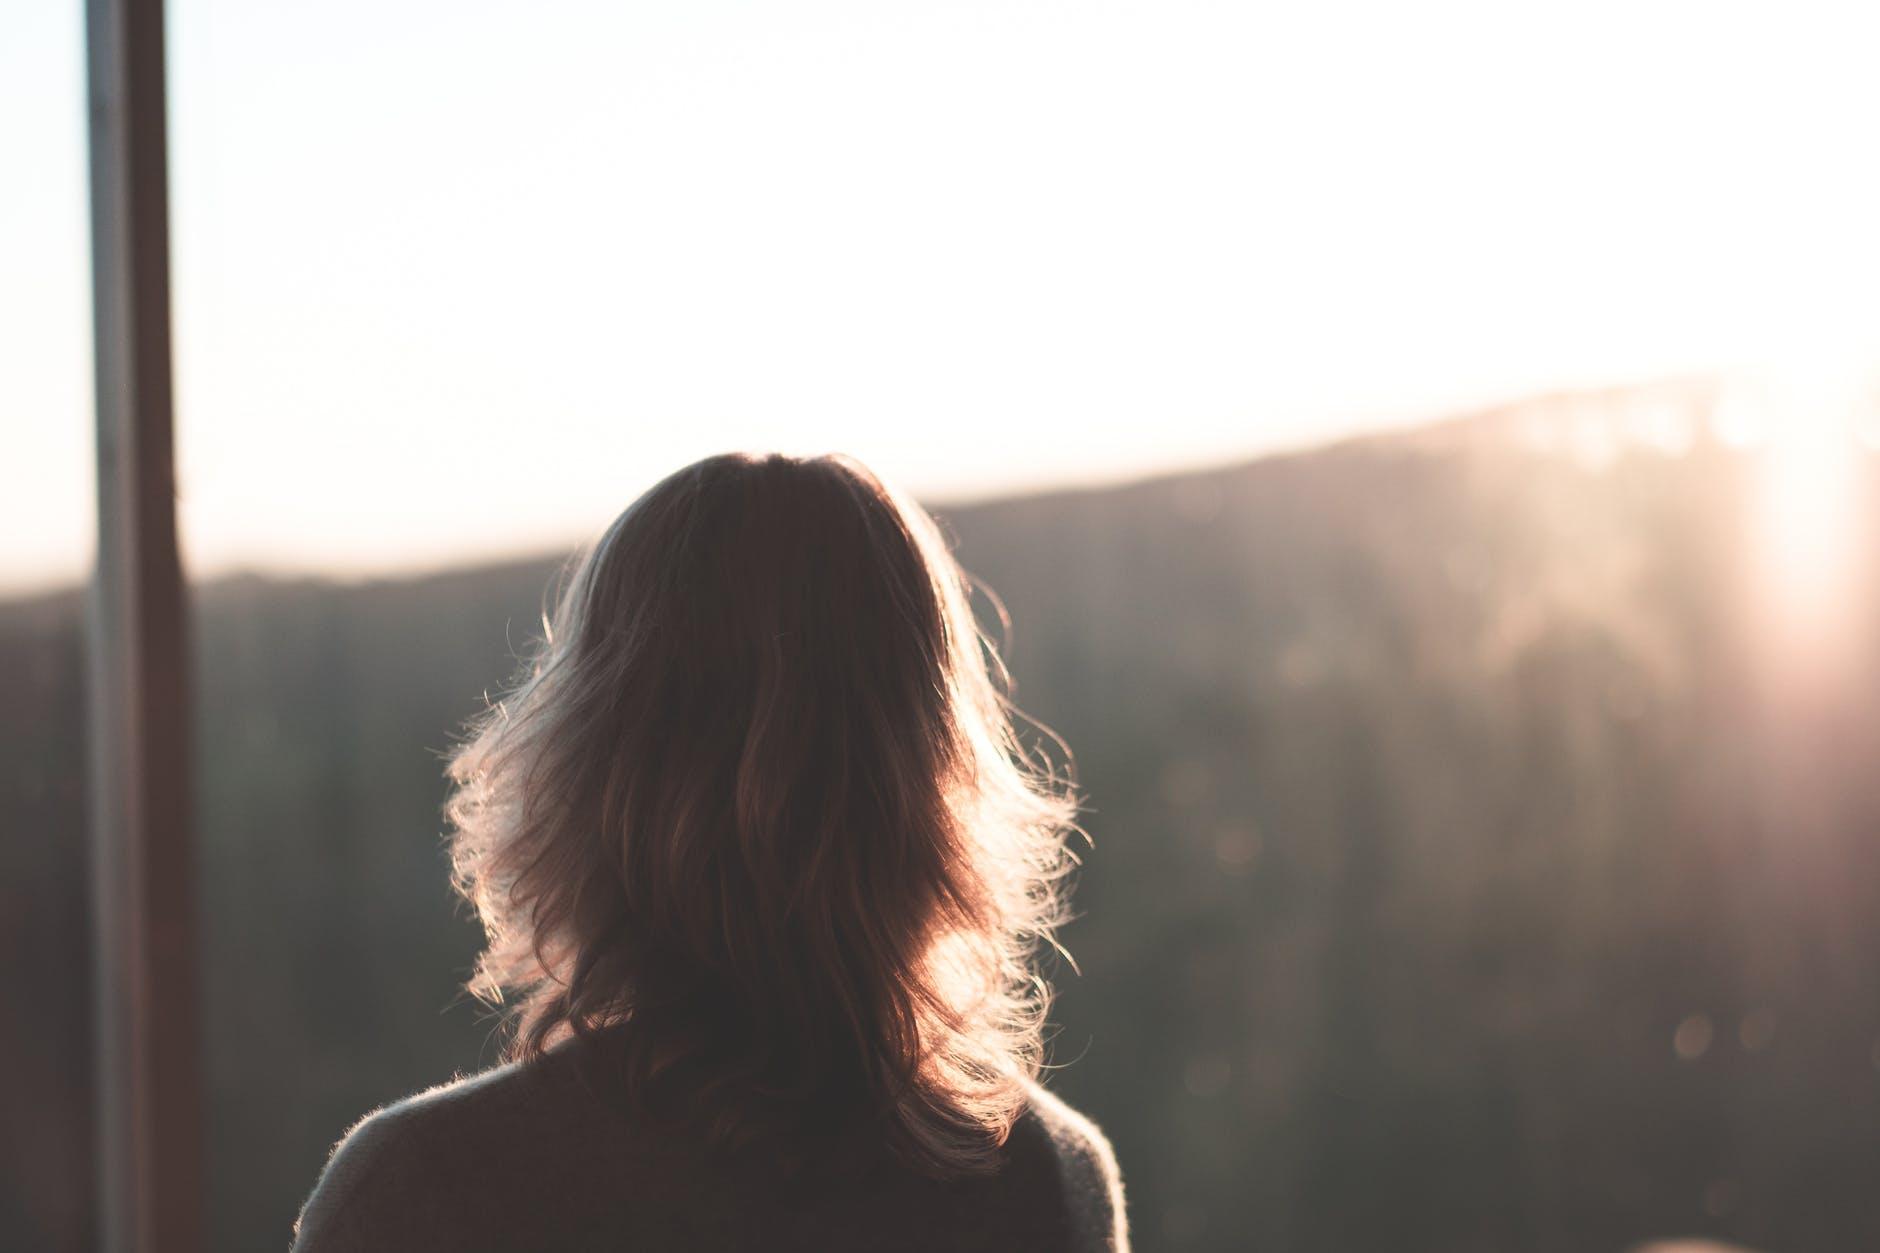 anonymous woman enjoying mountain view at sunset